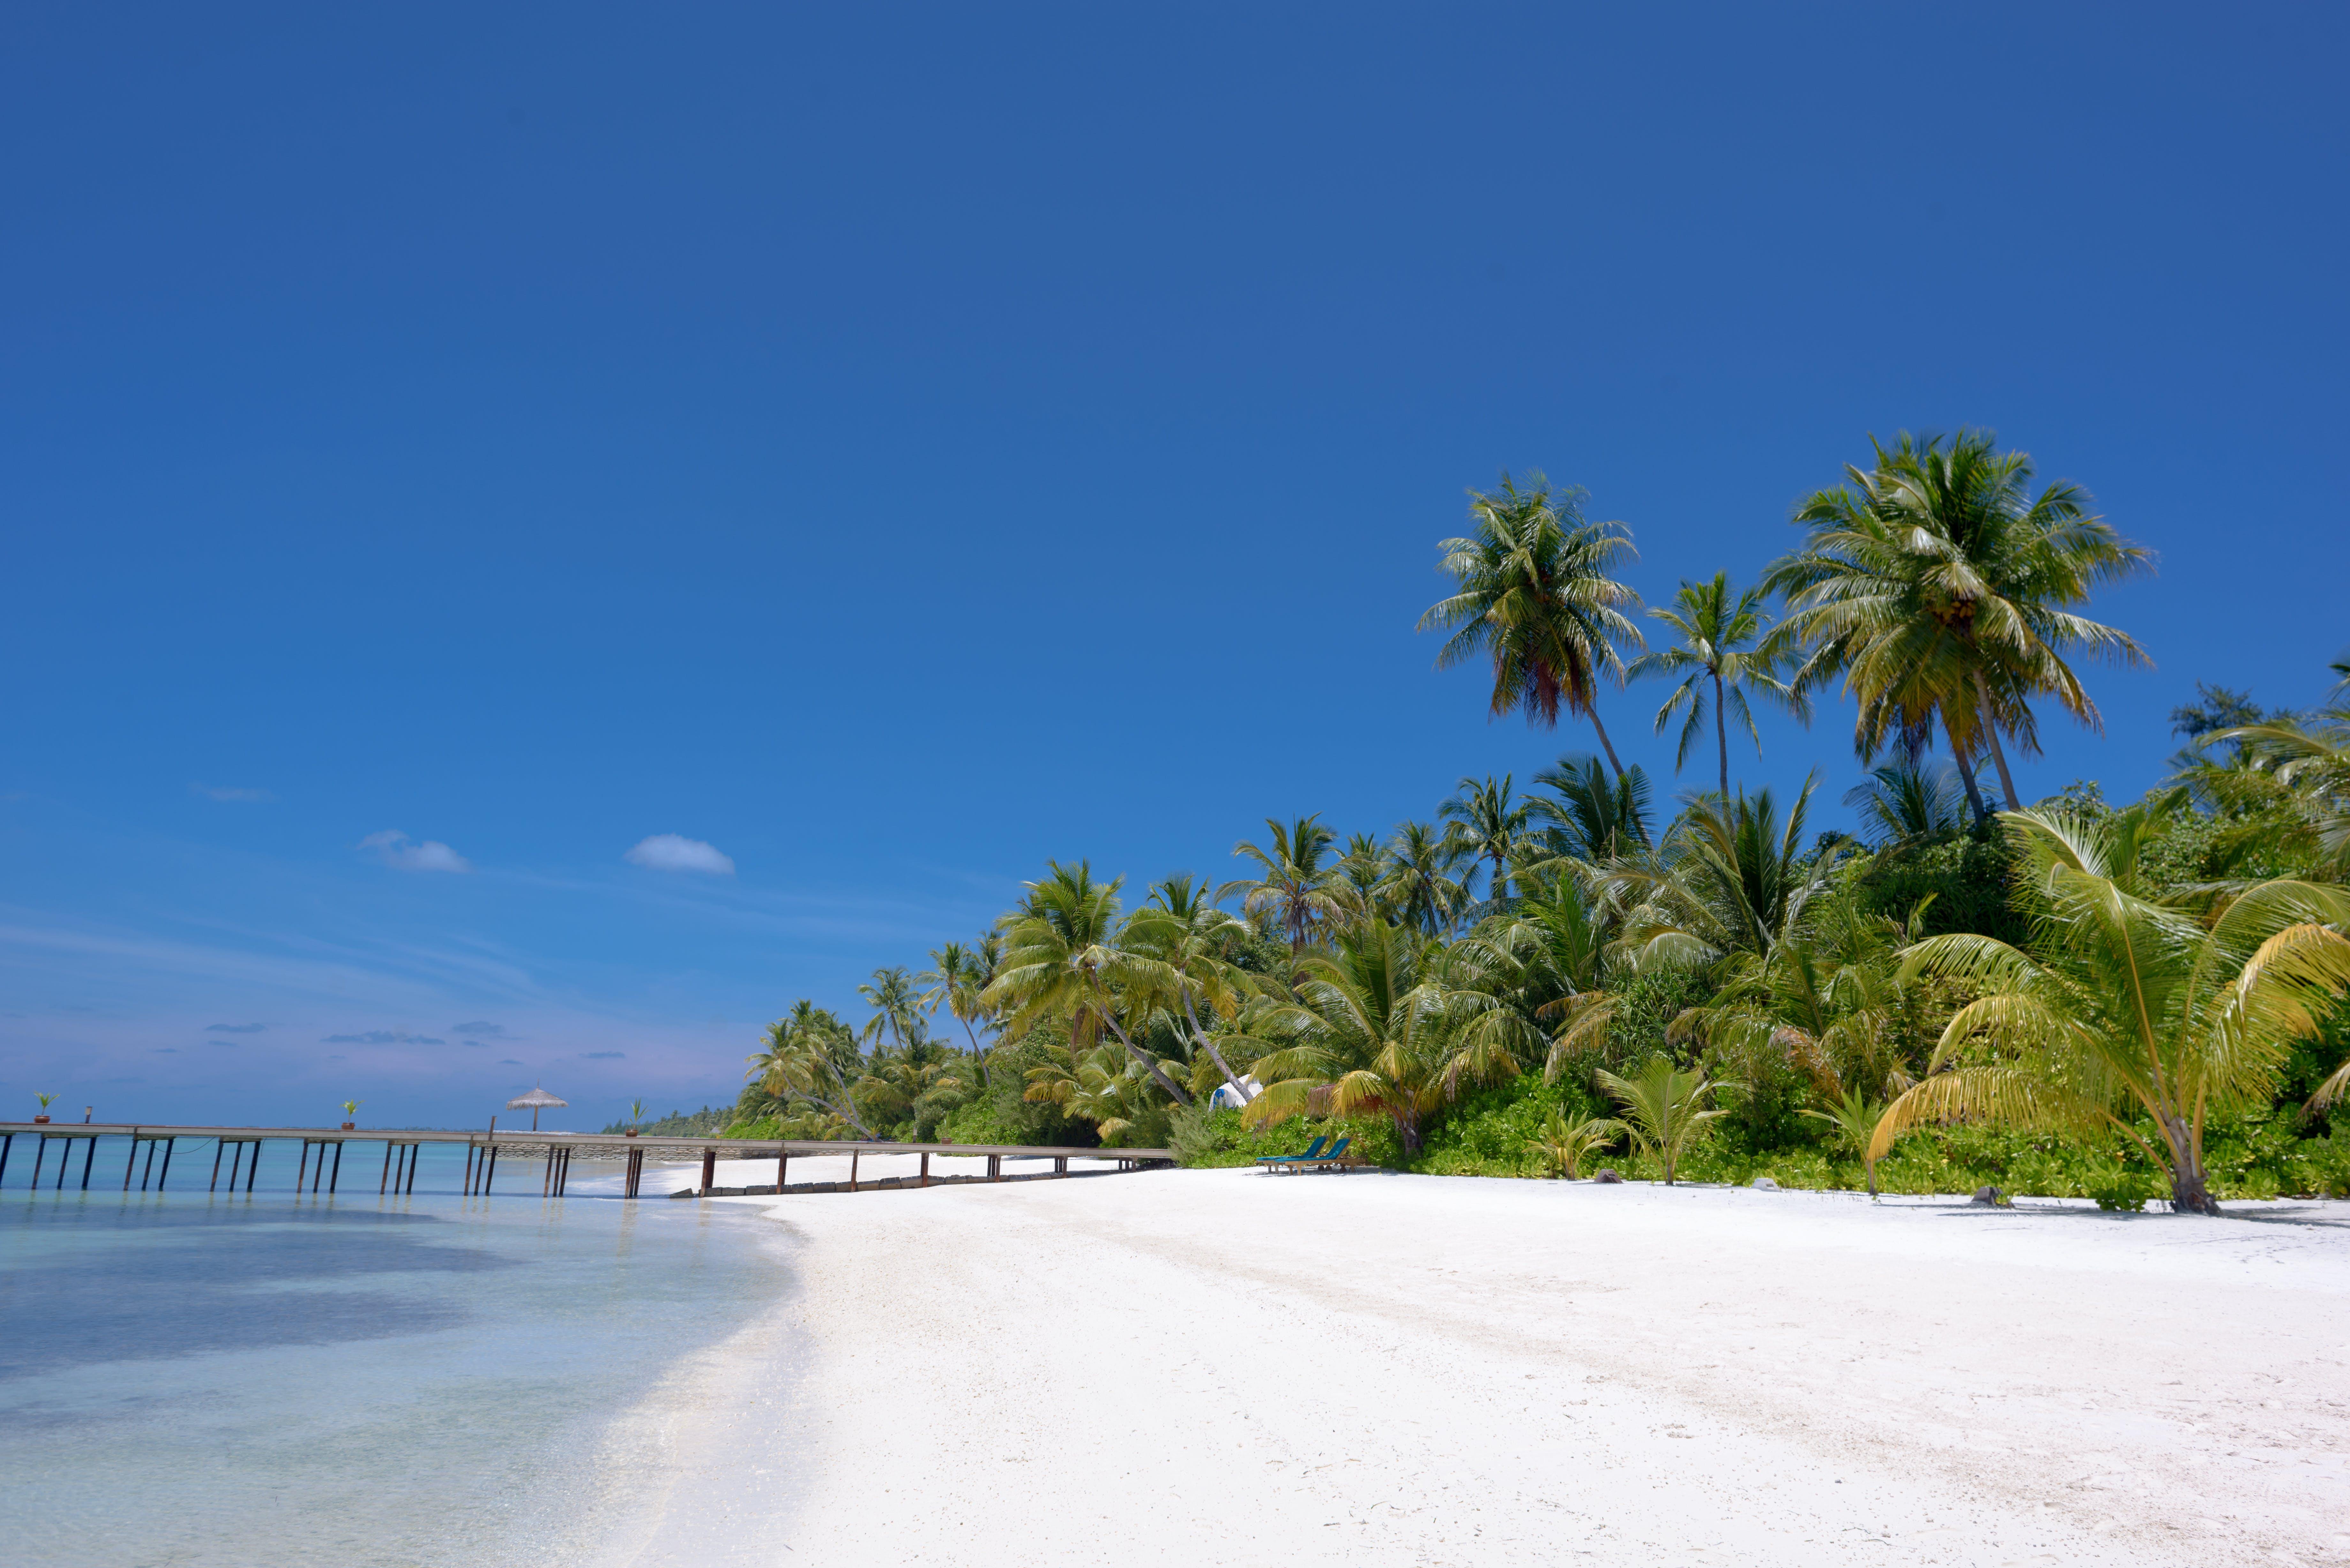 Brown Dock Near Coconut Trees